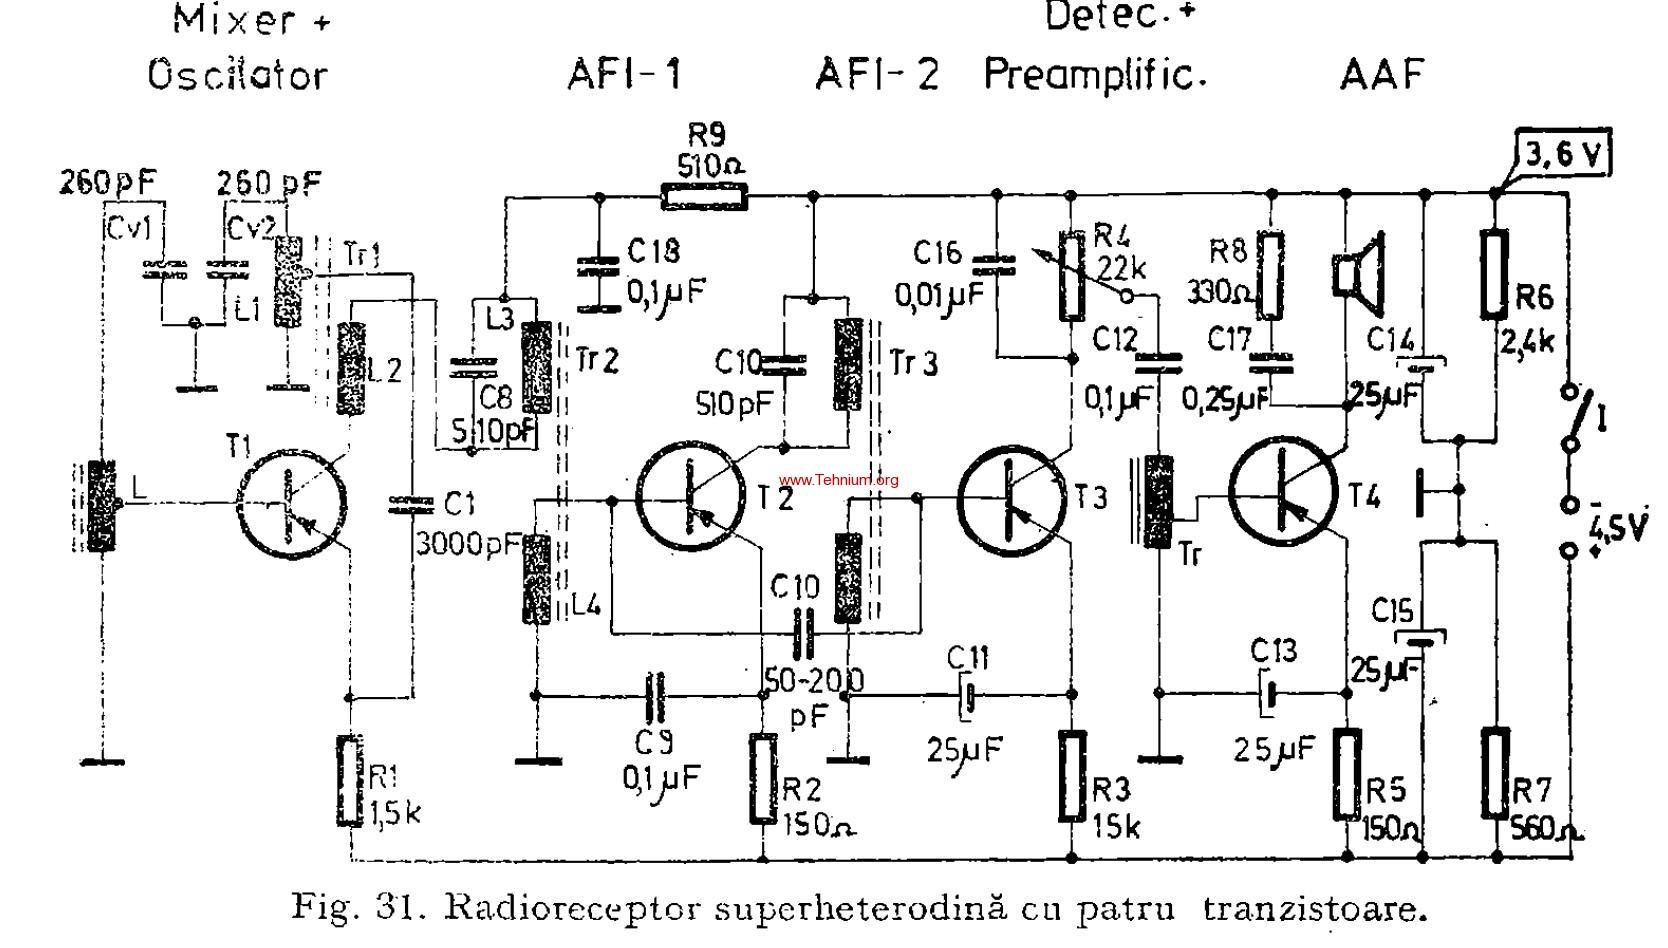 Radioreceptor superheterodina cu patru tranzistoare 1